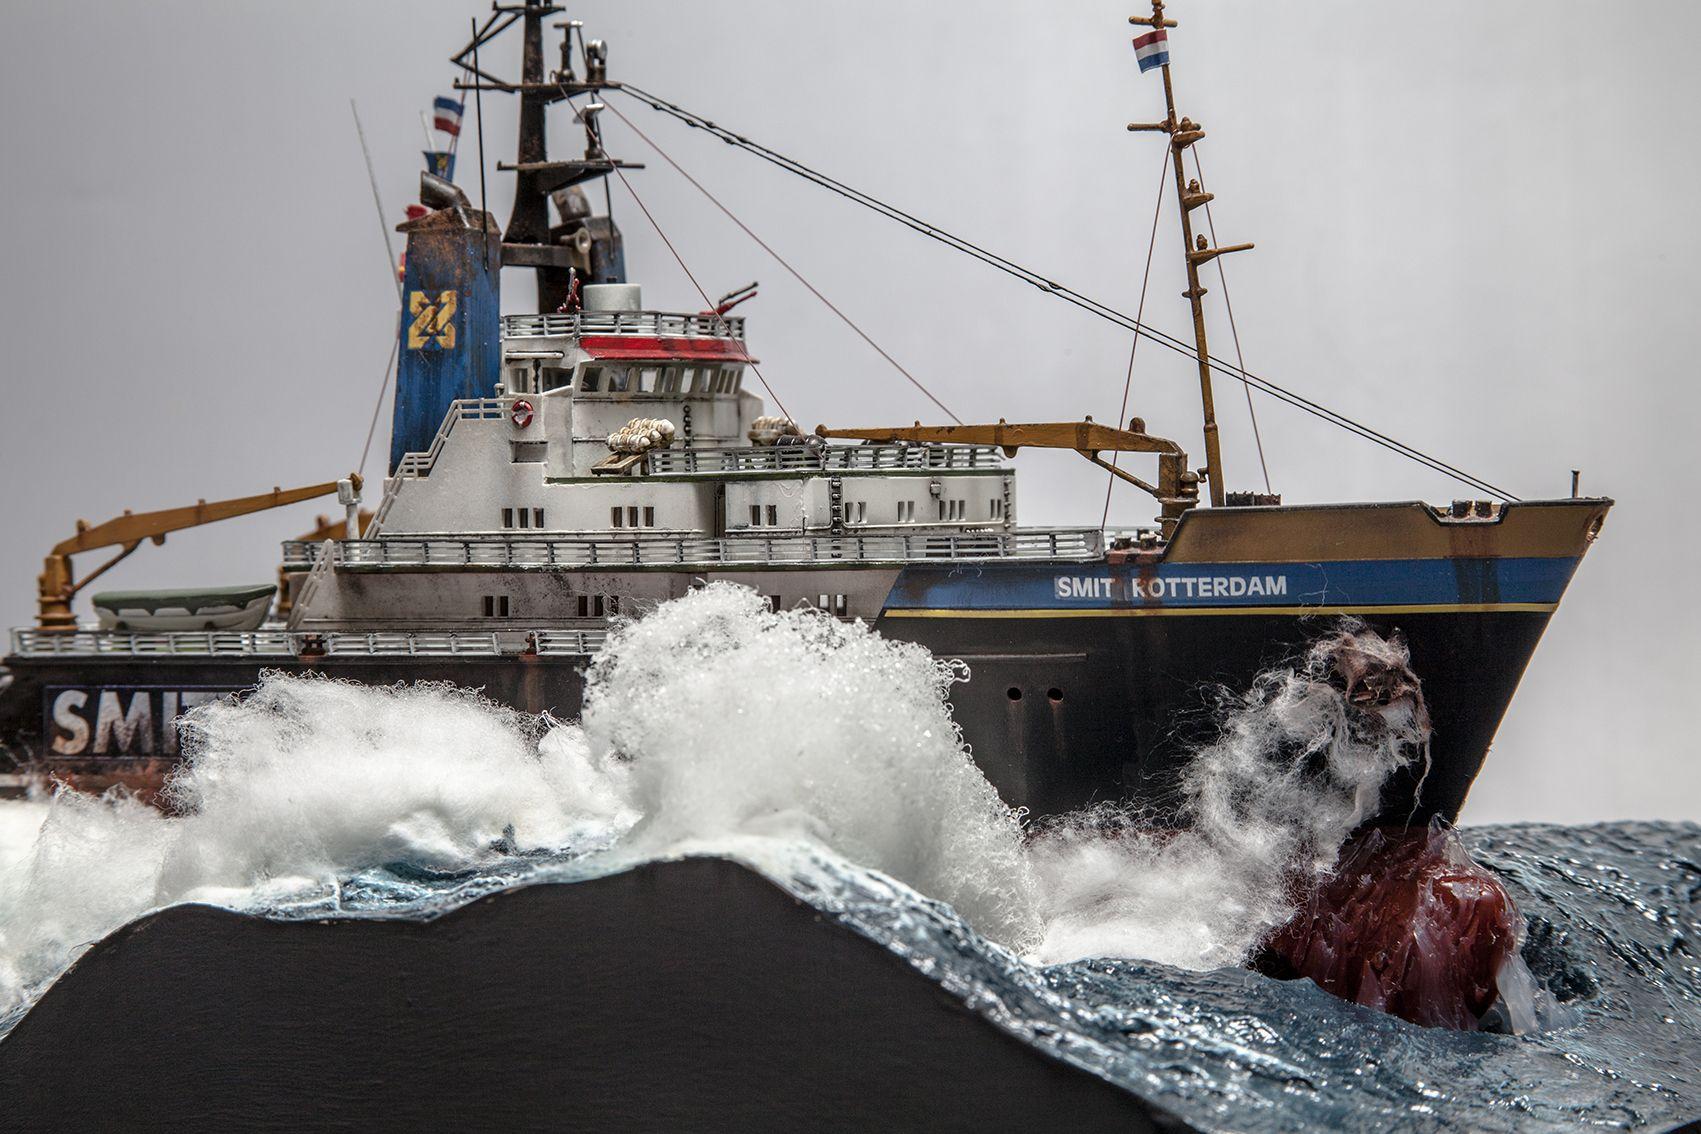 1:120 Heller Tug diorama in rough sea